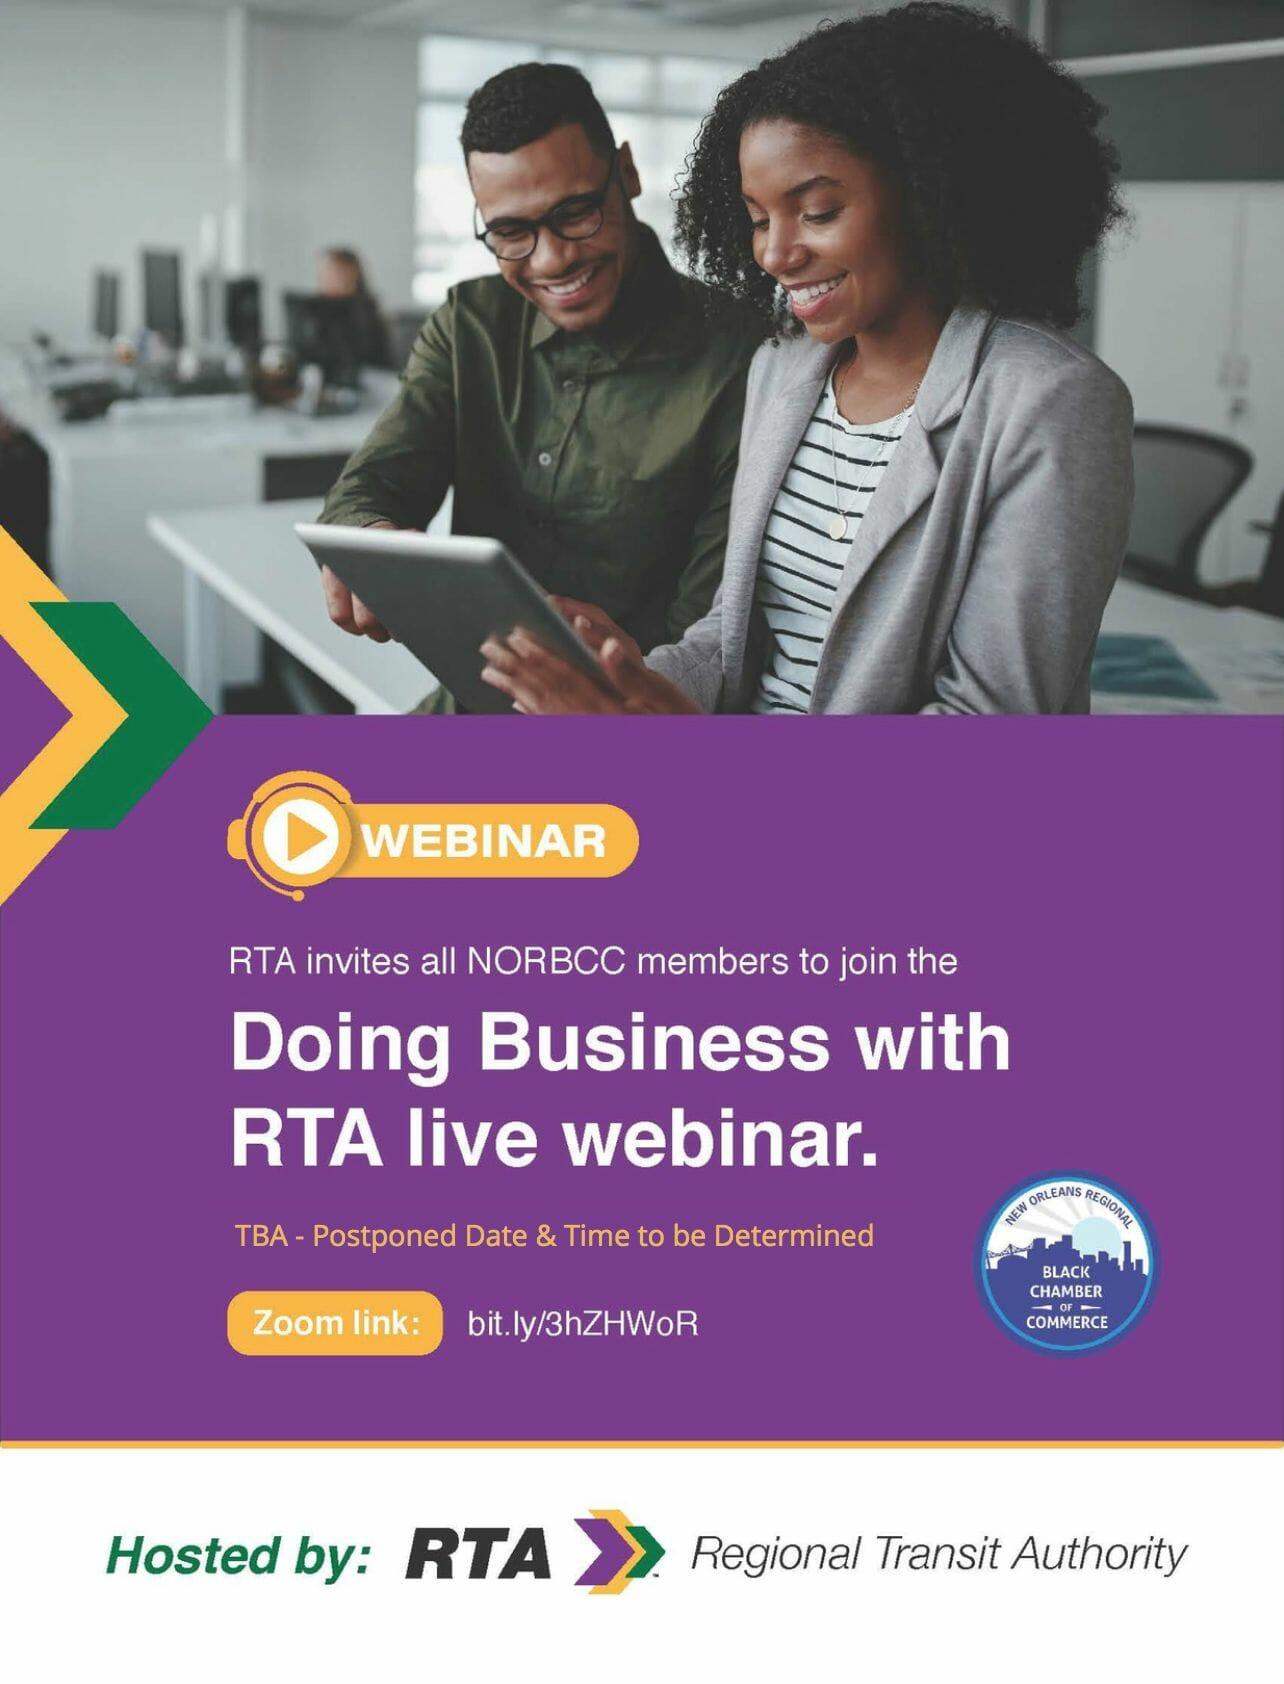 RTA Live Webinar